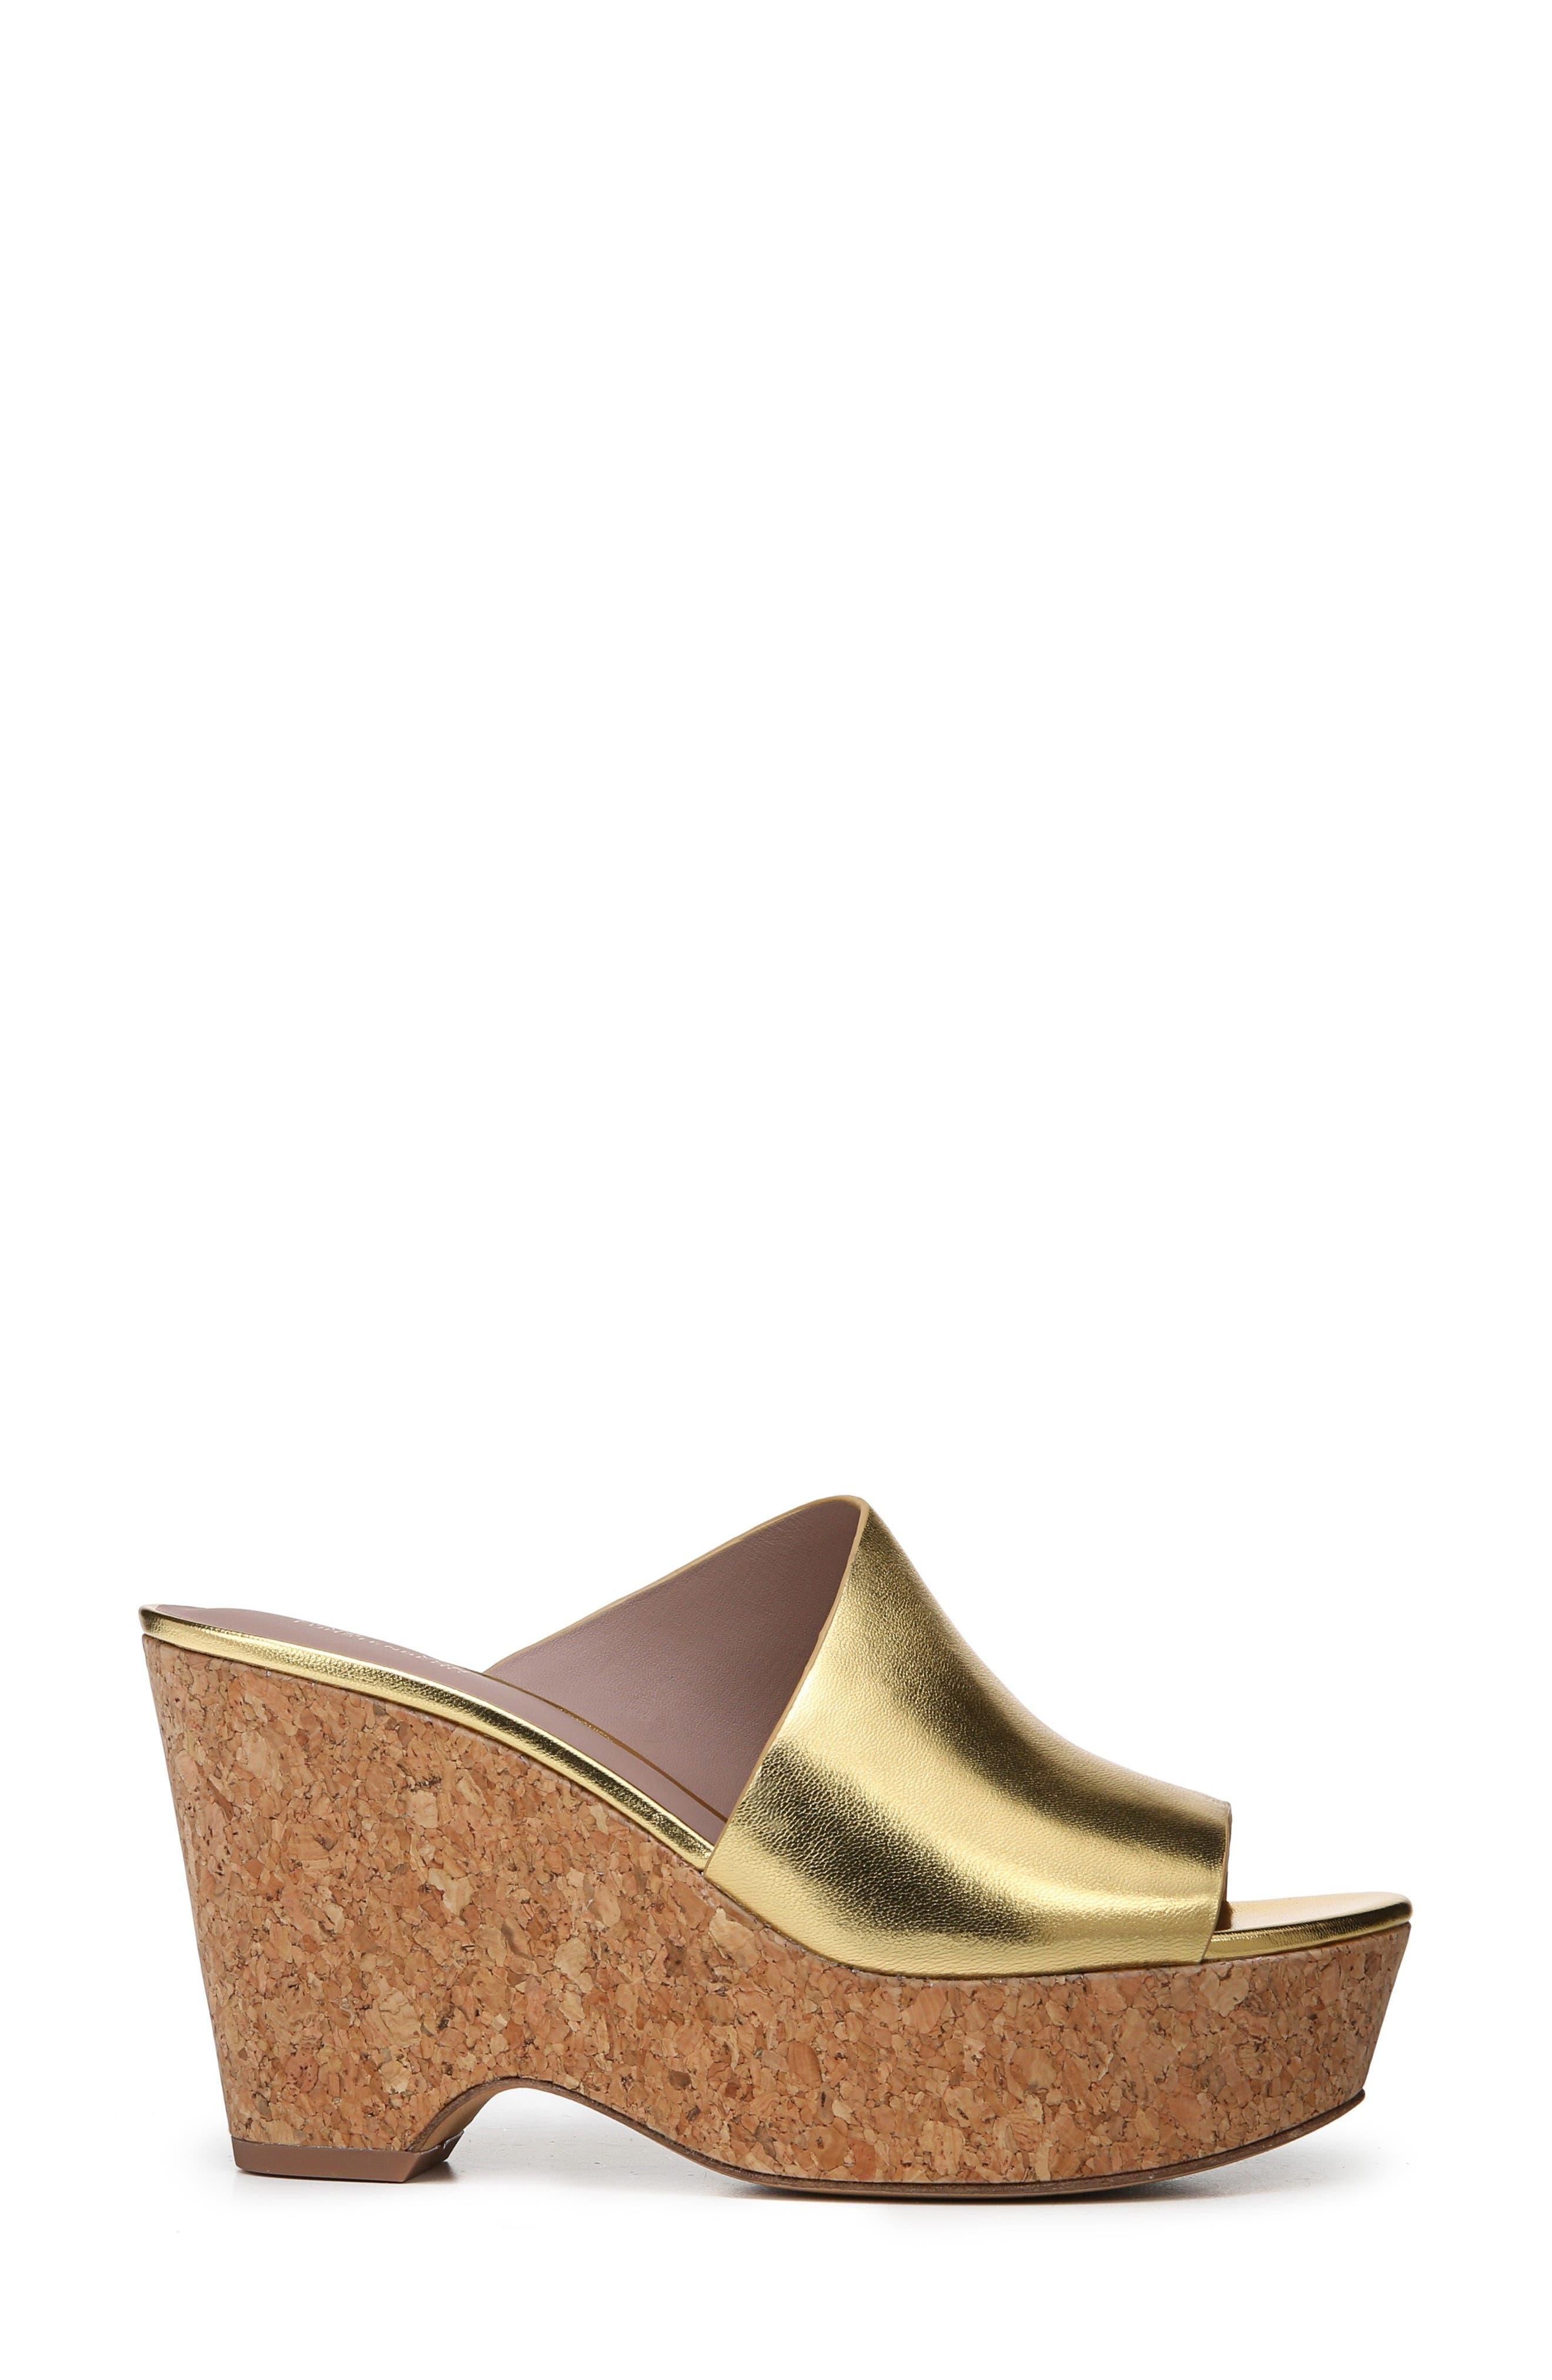 Bonnie Wedge Slide Sandal,                             Alternate thumbnail 3, color,                             Gold